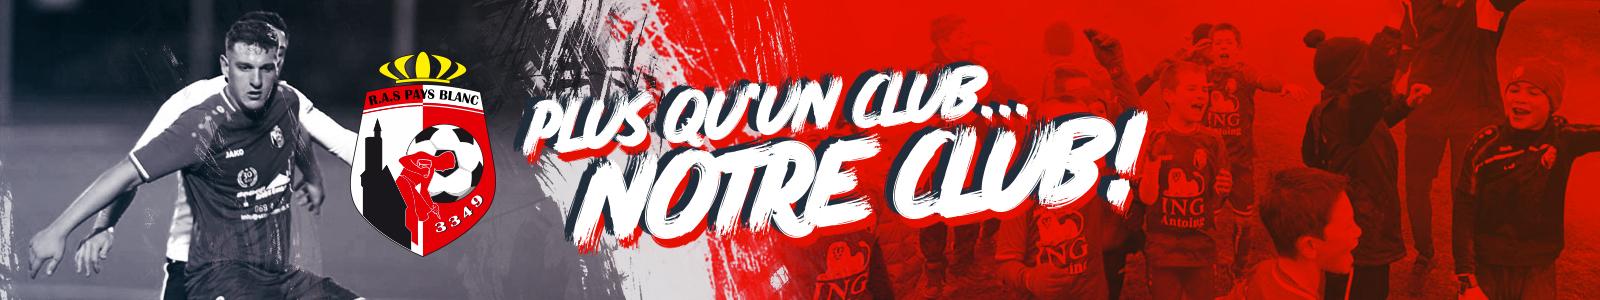 R.A.S. Pays Blanc Antoinien : site officiel du club de foot de ANTOING - footeo